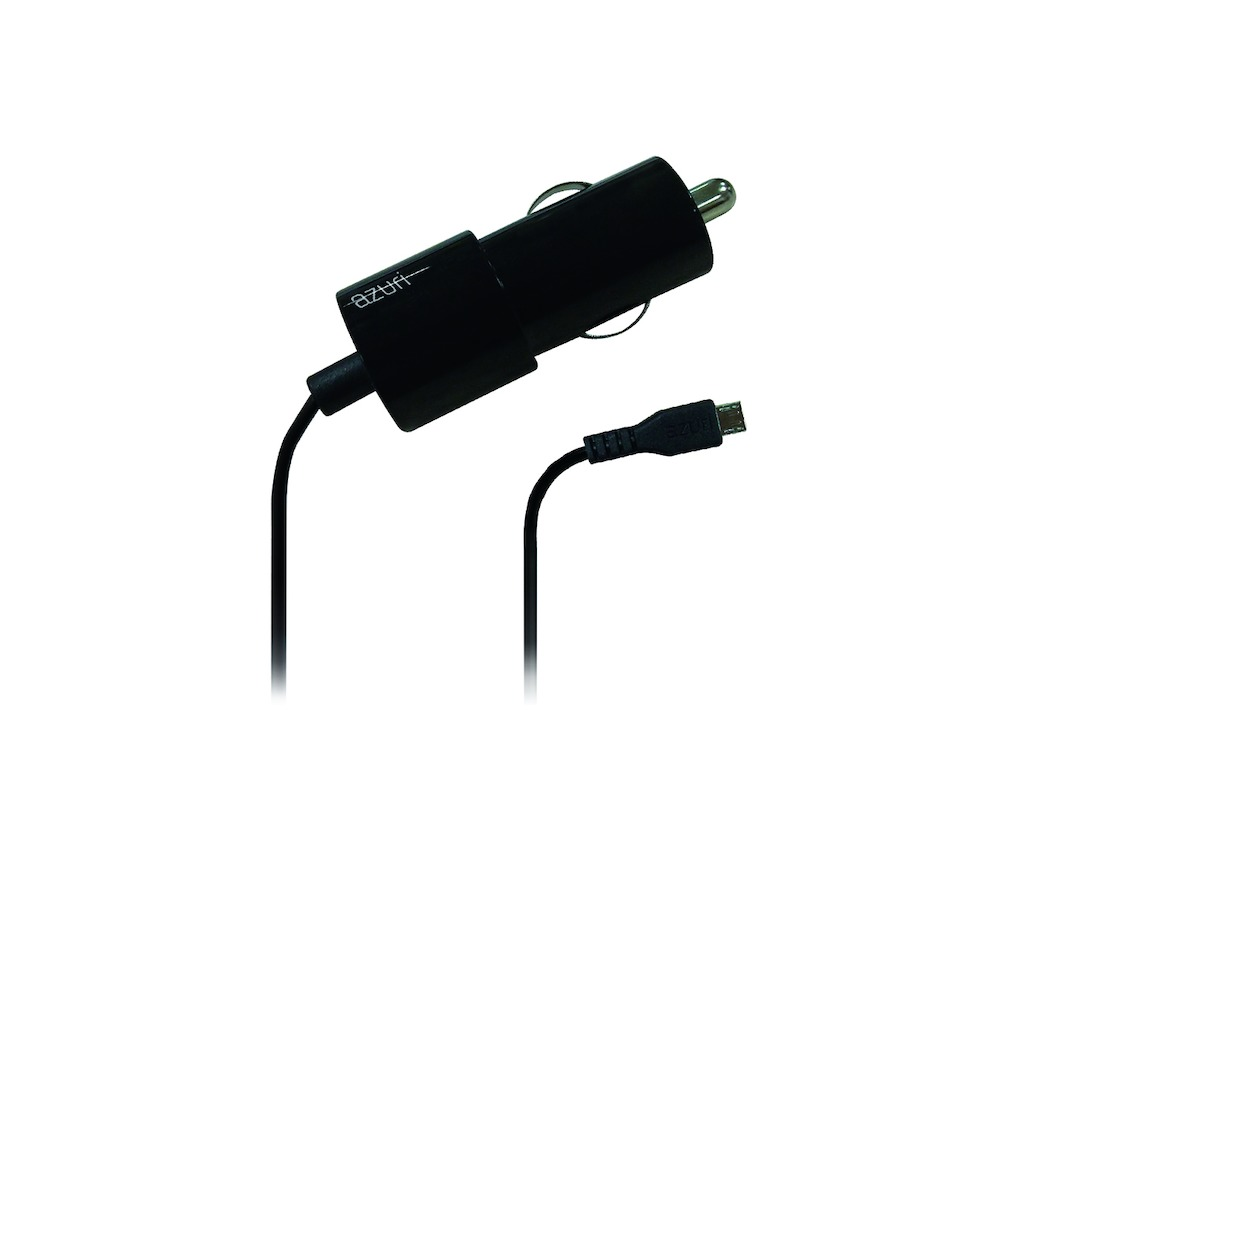 Afbeelding van Azuri oplader Autolader Micro USB zwart